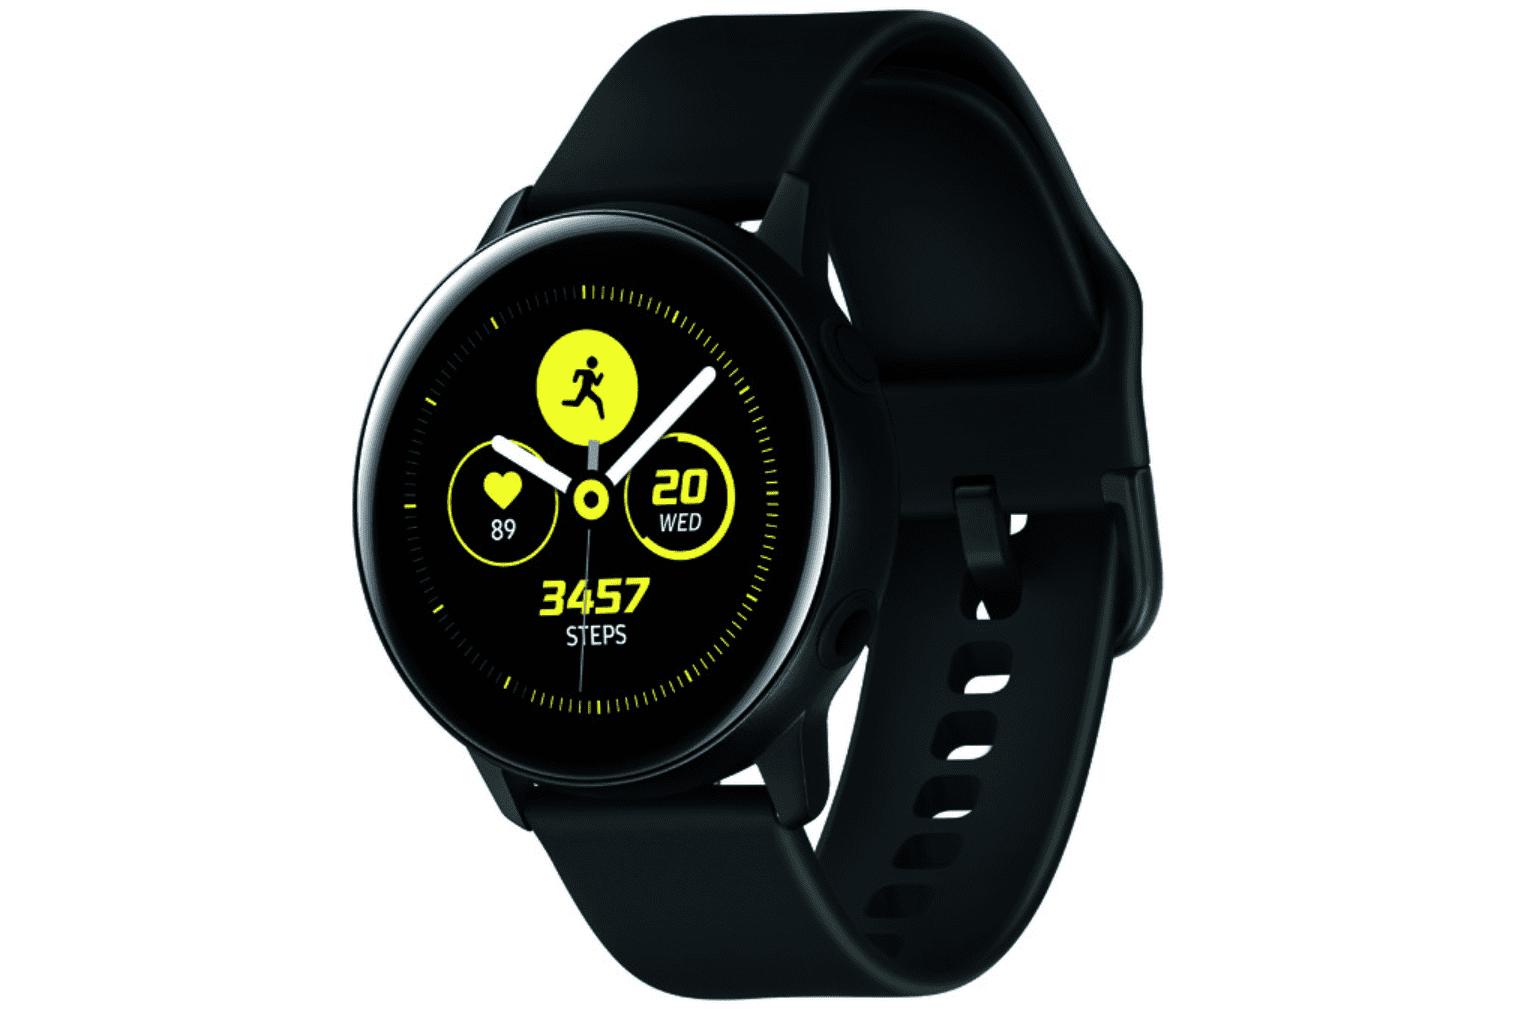 859998dd84 SAMSUNG Galaxy Watch Active - Bluetooth Smart Watch (40mm) Black -  SM-R500NZKAXAR - Walmart.com